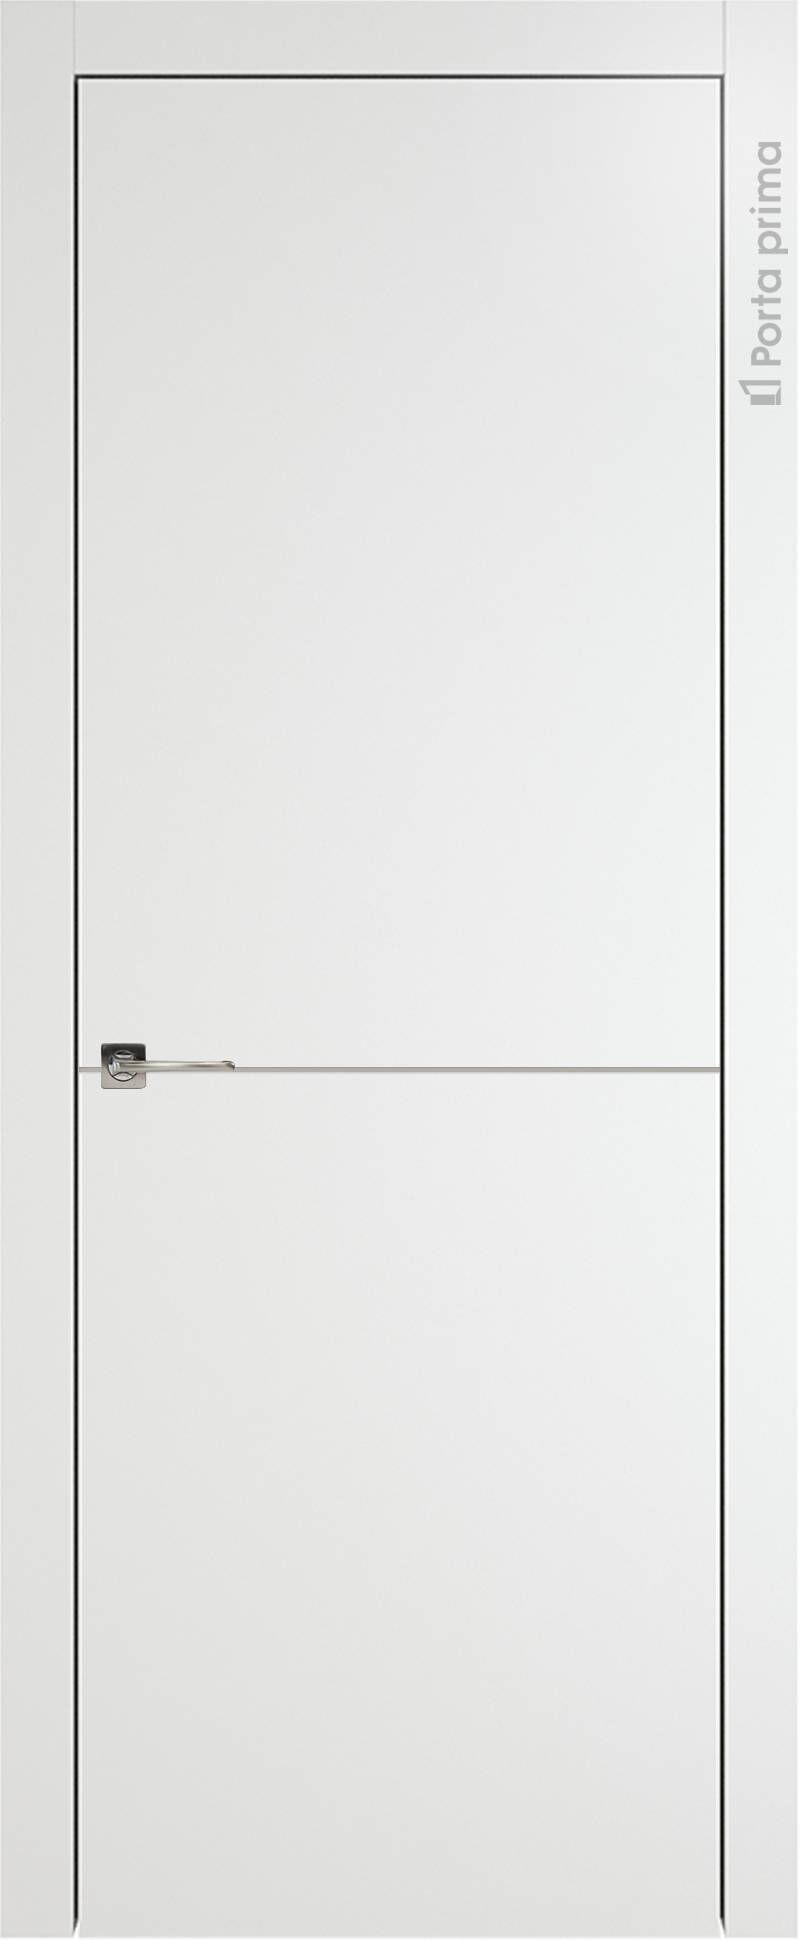 Tivoli Б-2 цвет - Белая эмаль (RAL 9003) Без стекла (ДГ)